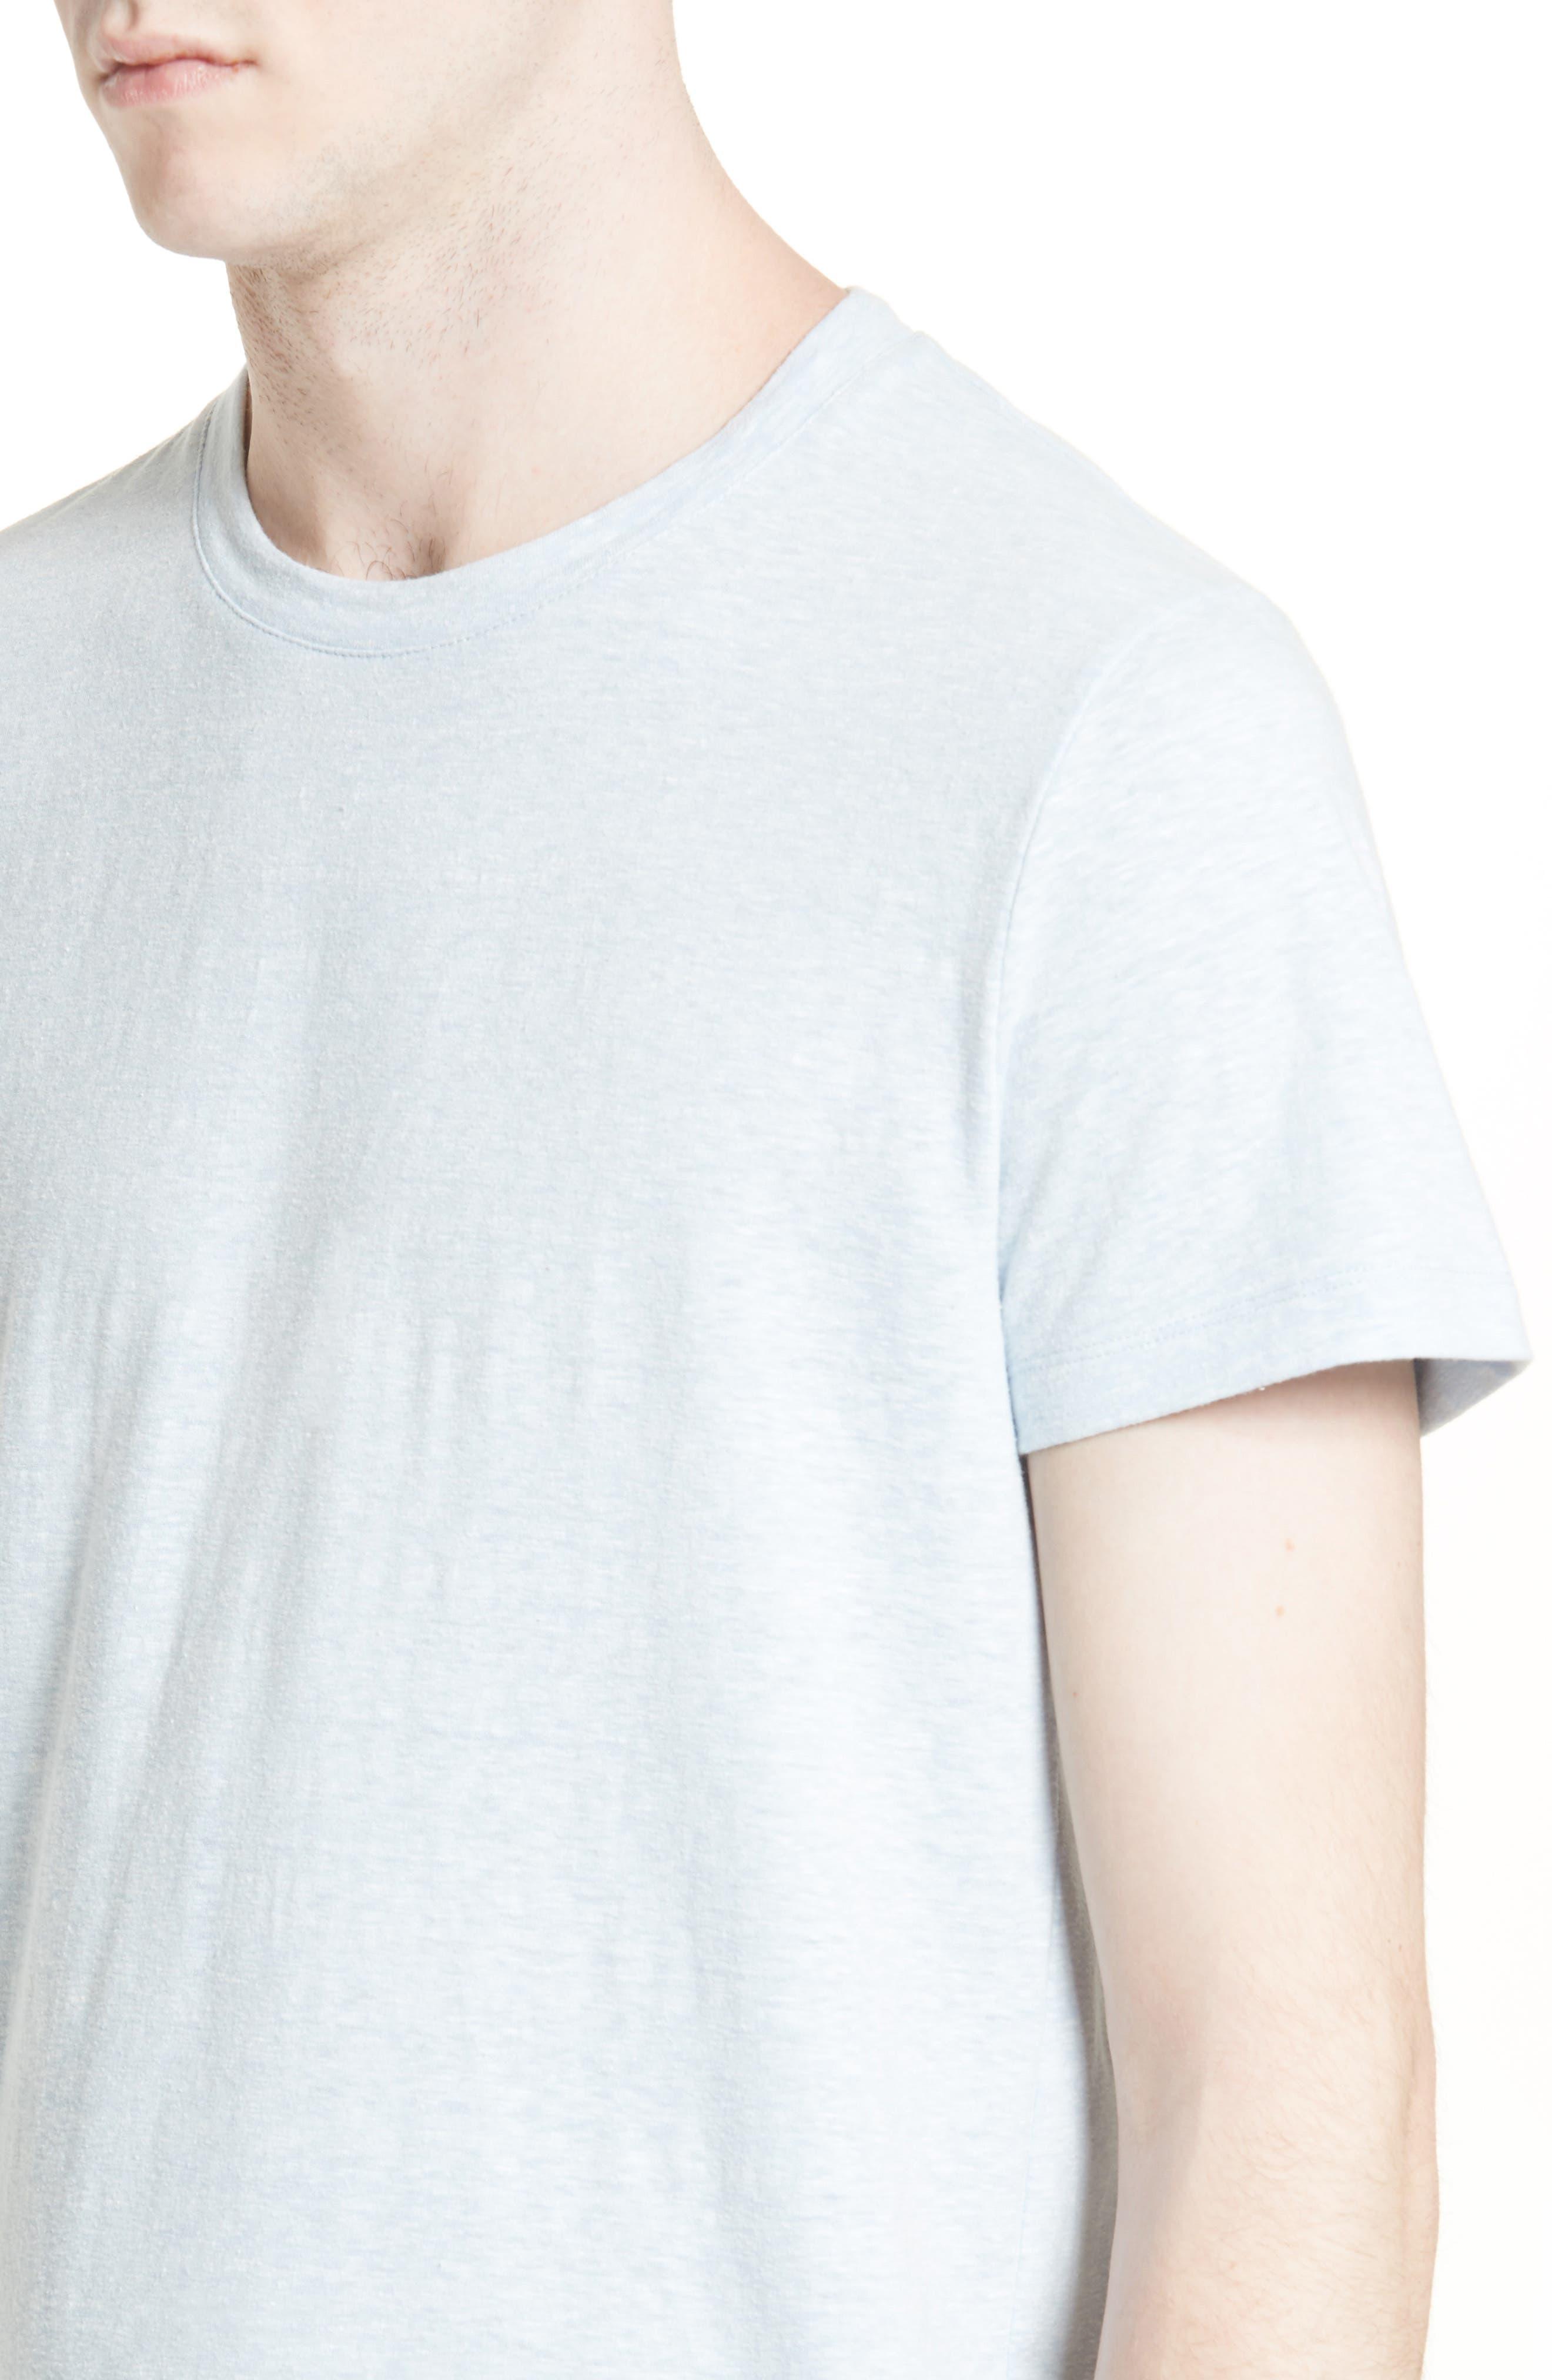 Jimmy T-Shirt,                             Alternate thumbnail 4, color,                             Blue